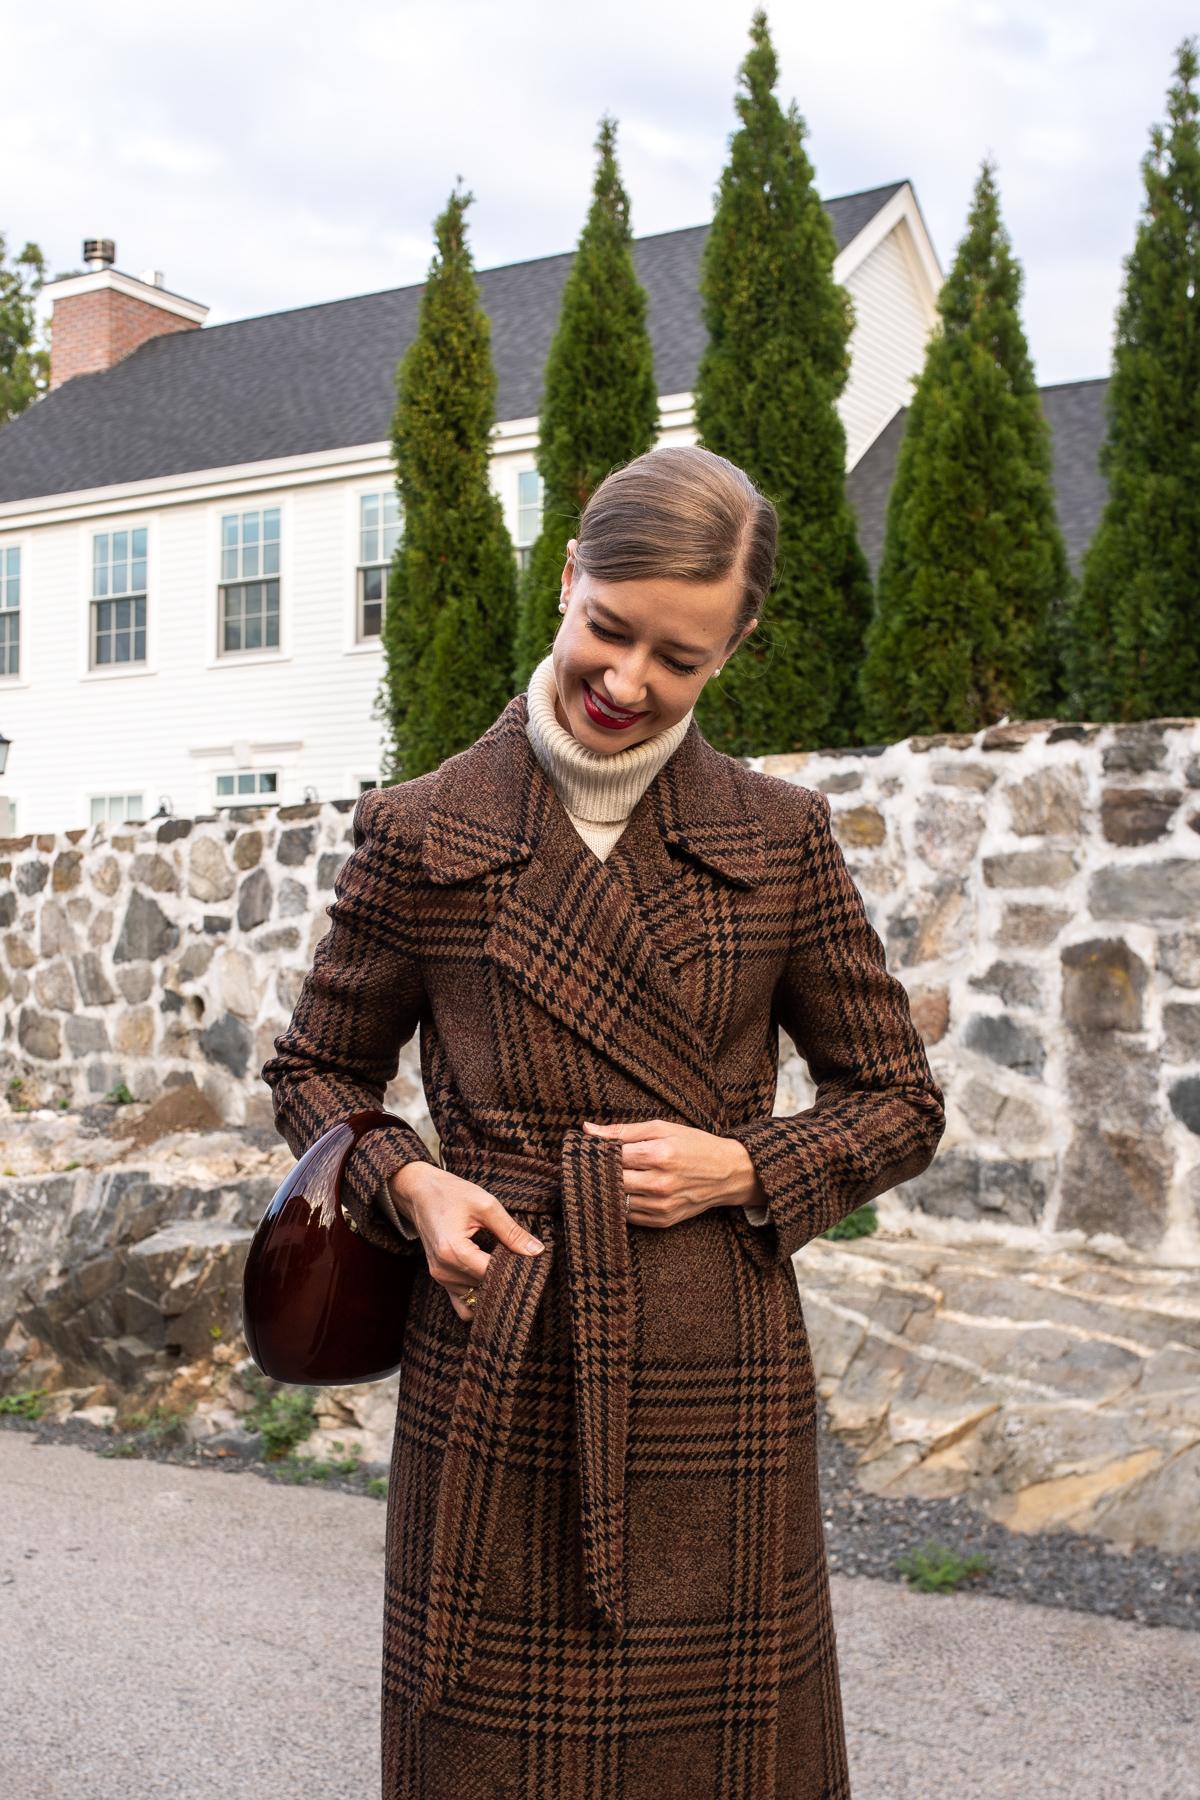 Stacie Flinner x Farfetch Plaid Wrap Coat-7.jpg